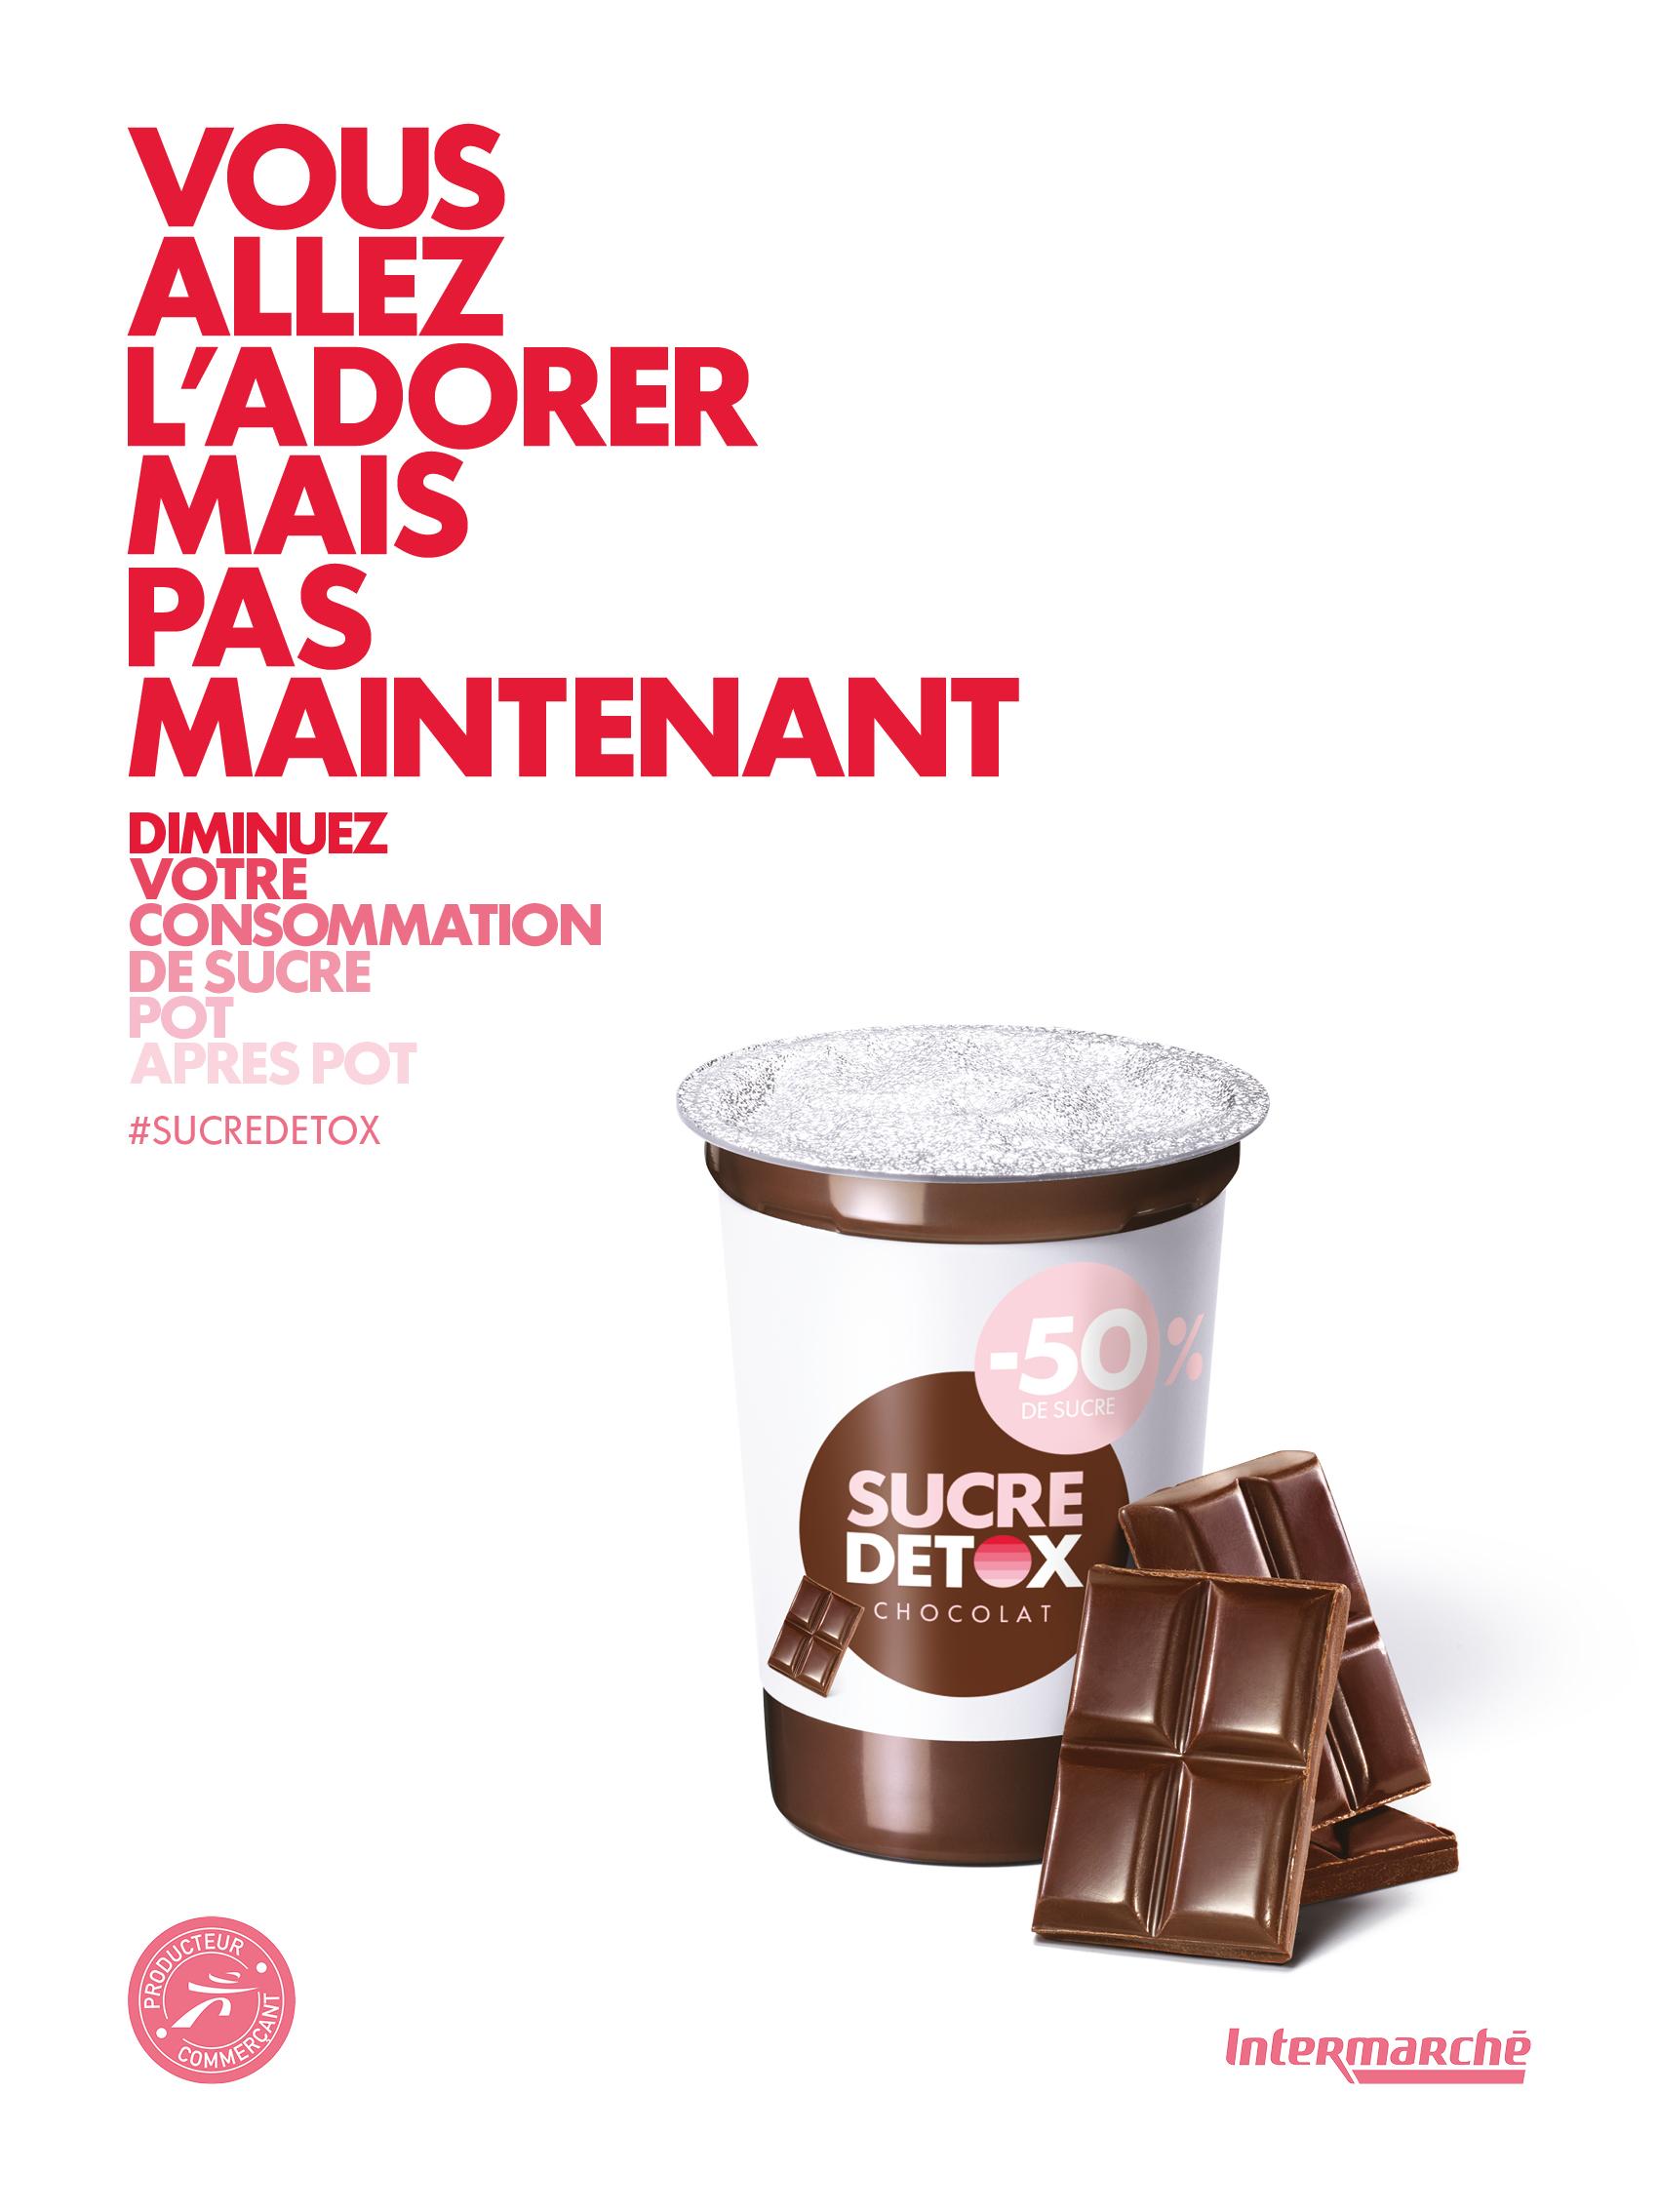 intermarche-sucre-detox-creme-dessert-pourcentage-sucre-semaine-agence-marcel-4